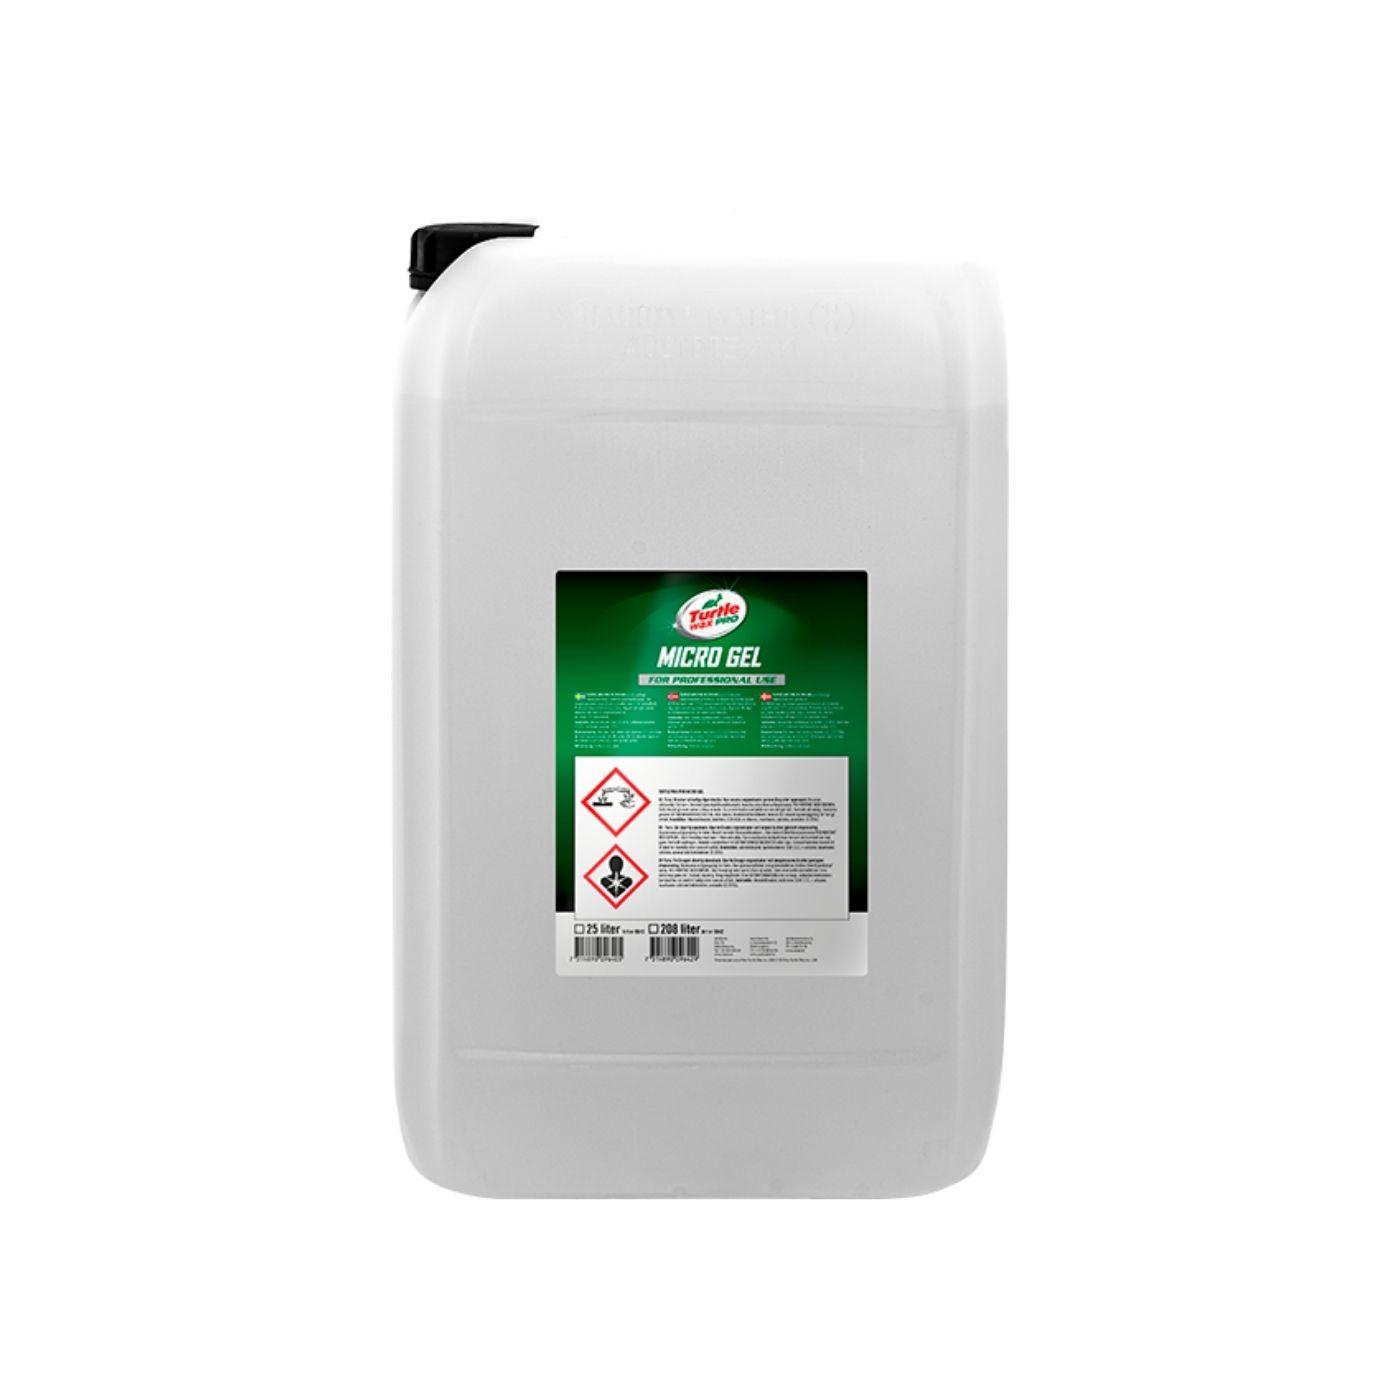 Förtvättsmedel Turtle Wax Pro Micro Gel, 25000 ml